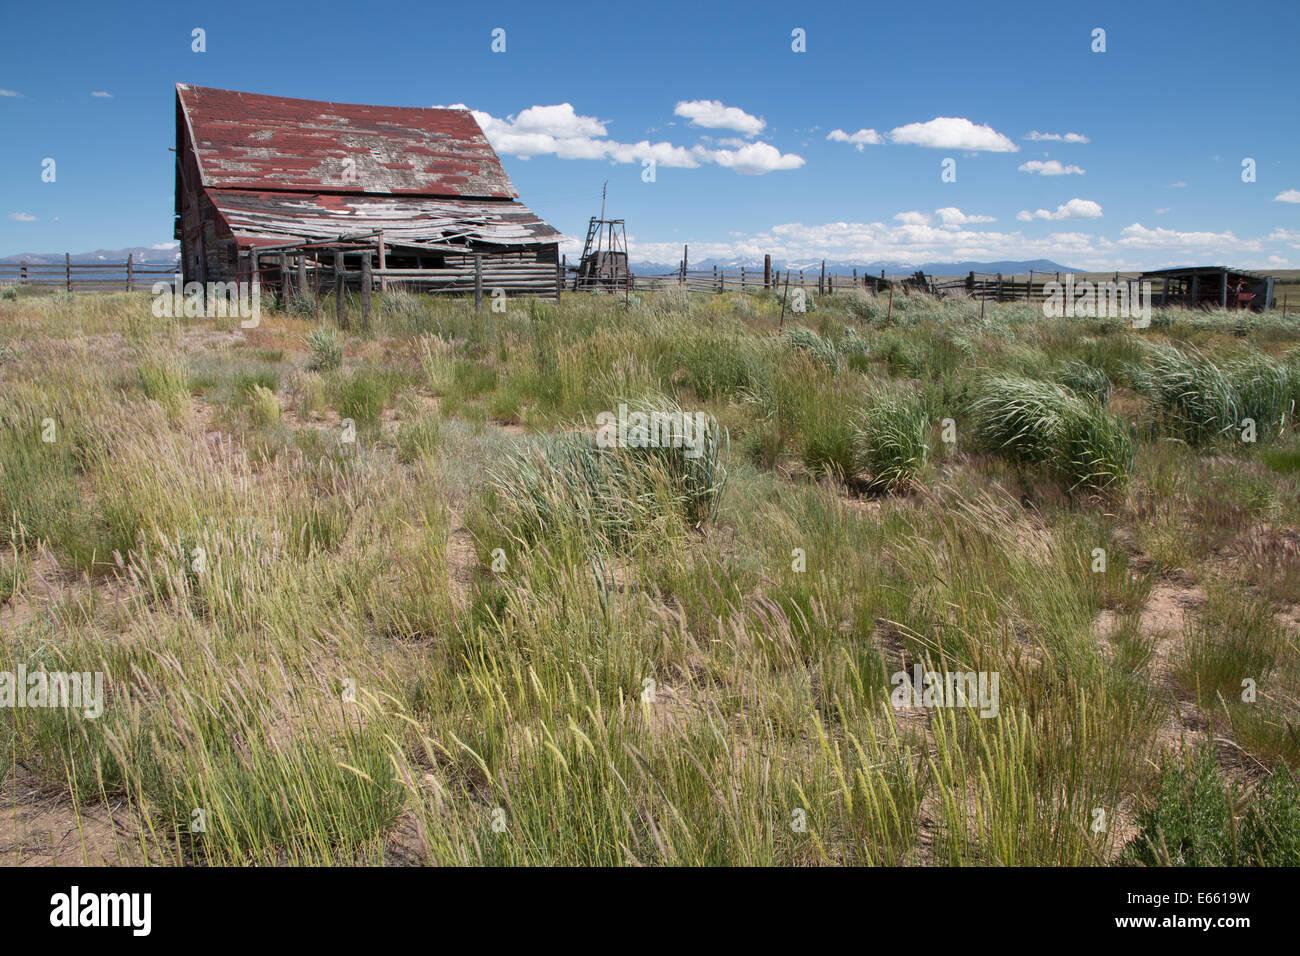 Old Abandoned Barn in the Arapaho National Wildlife Refuge - Stock Image